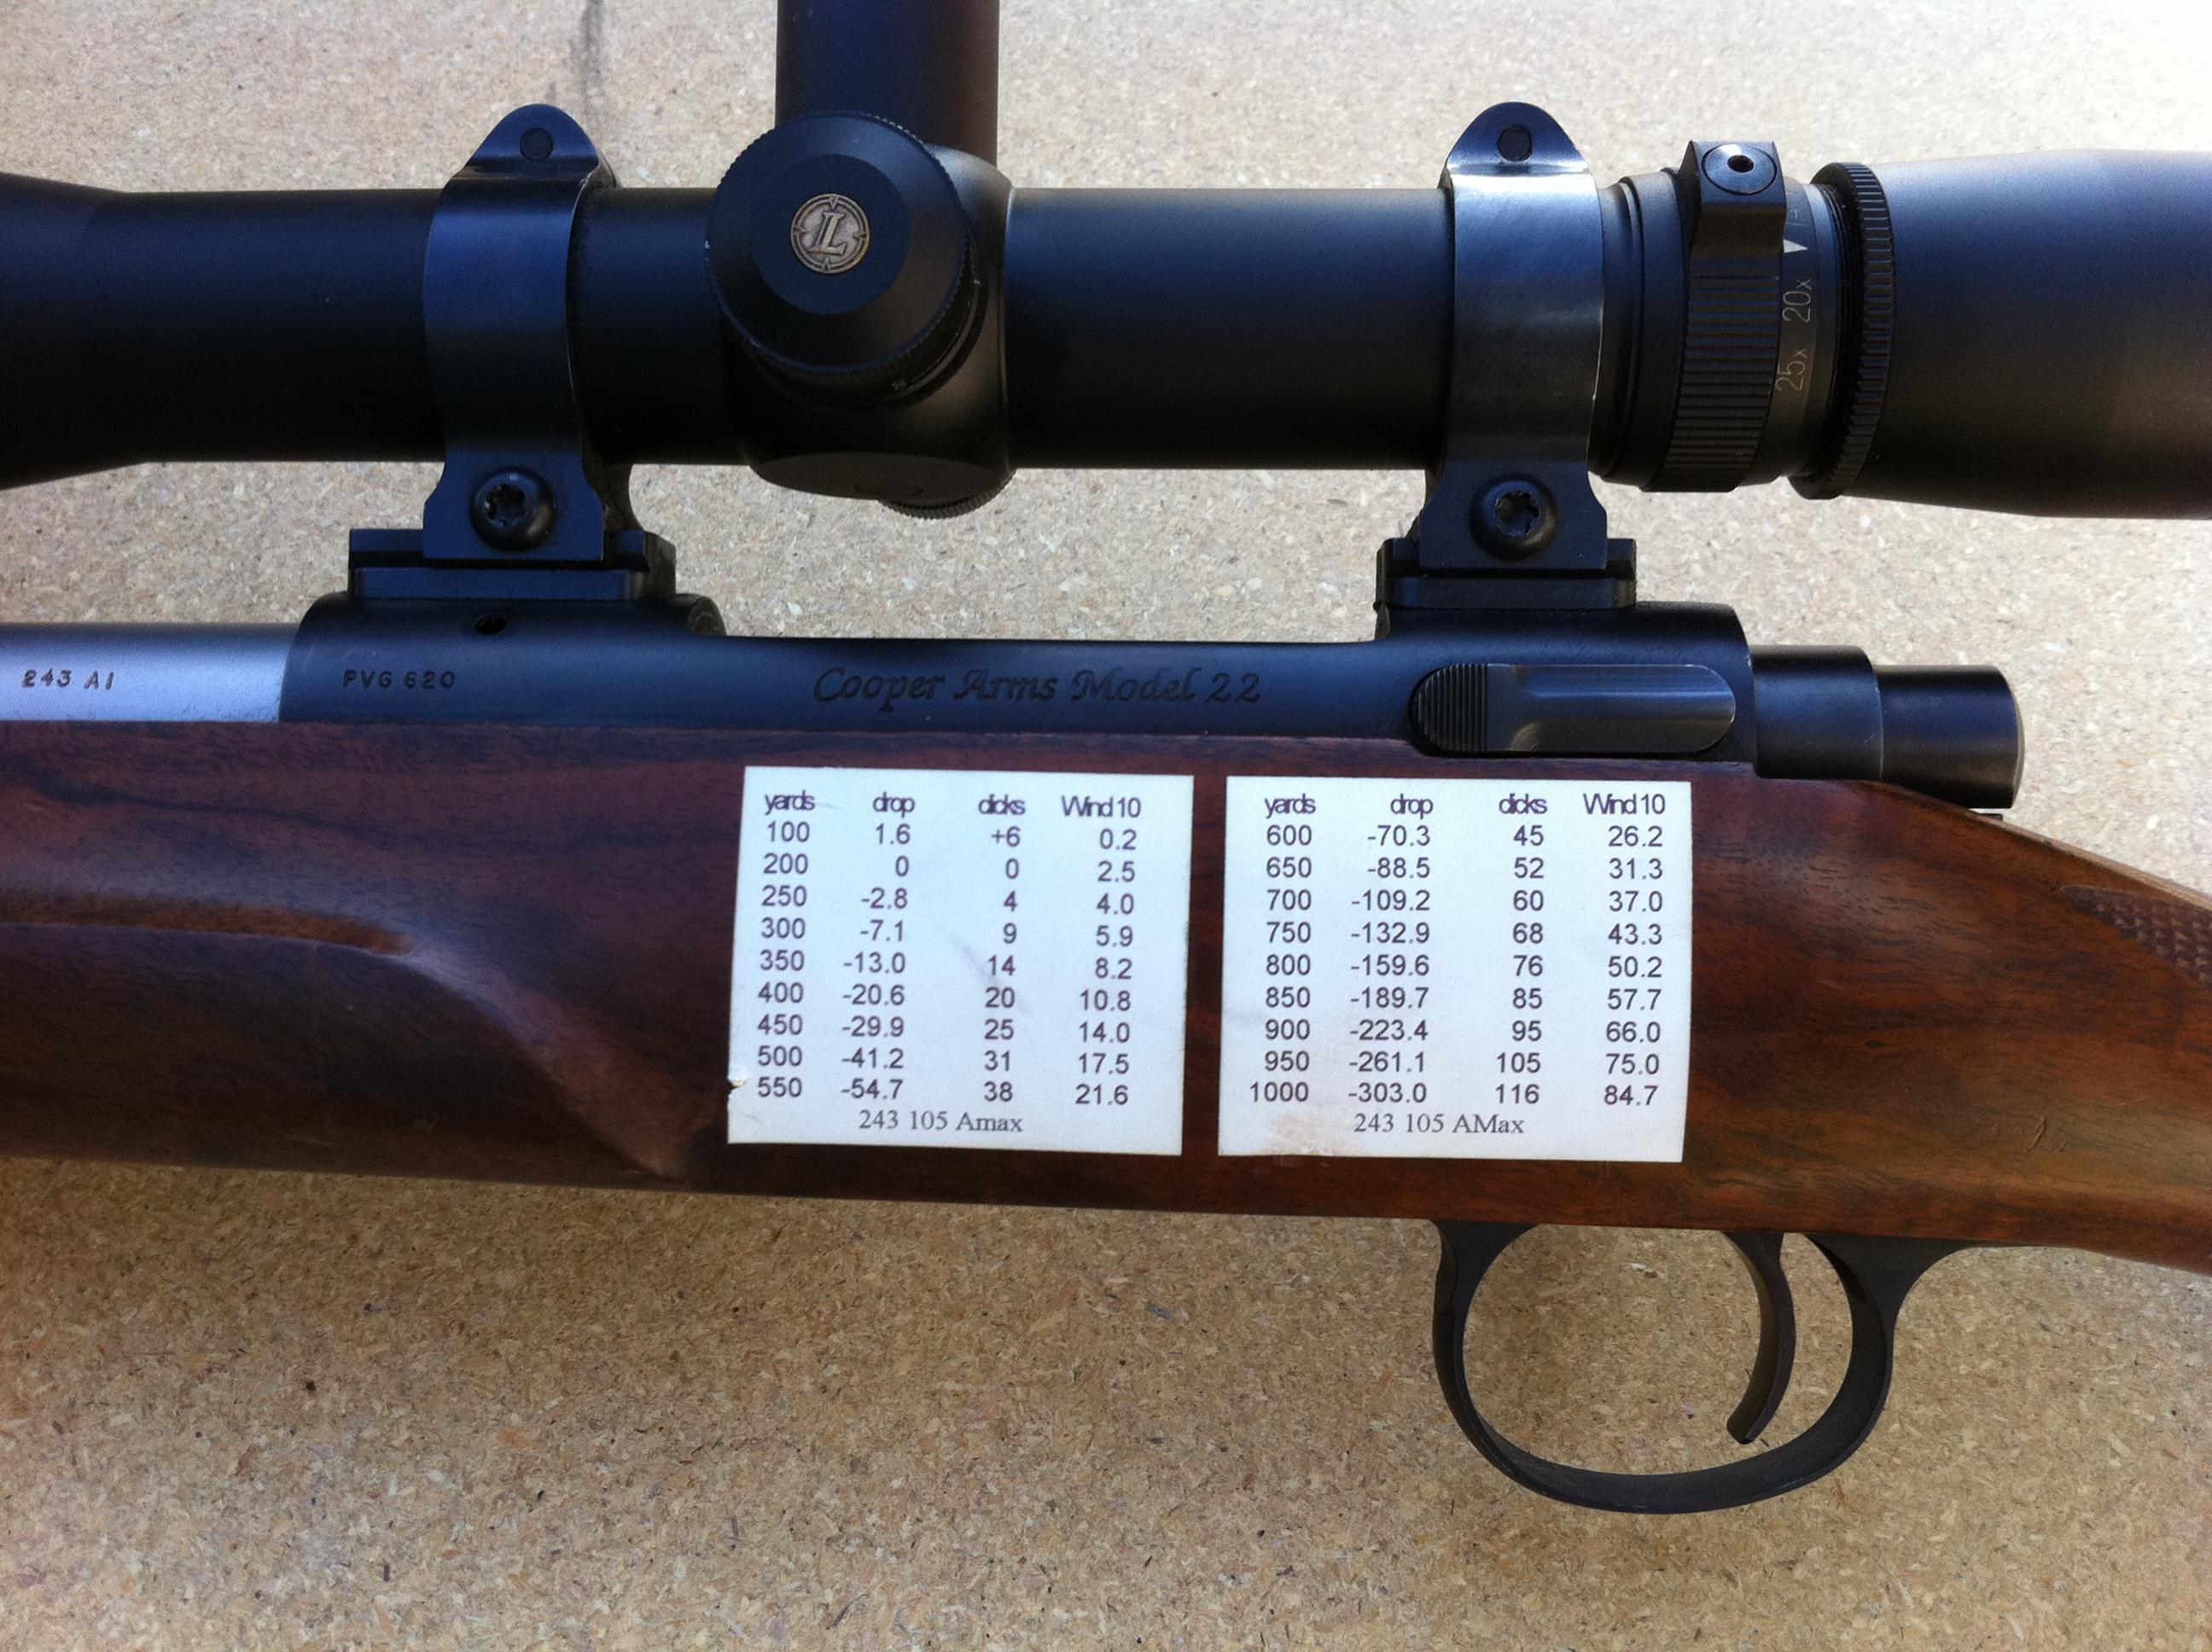 Bullet Size Chart 223: Cooper 243 dope sheet.jpg - Wikimedia Commons,Chart